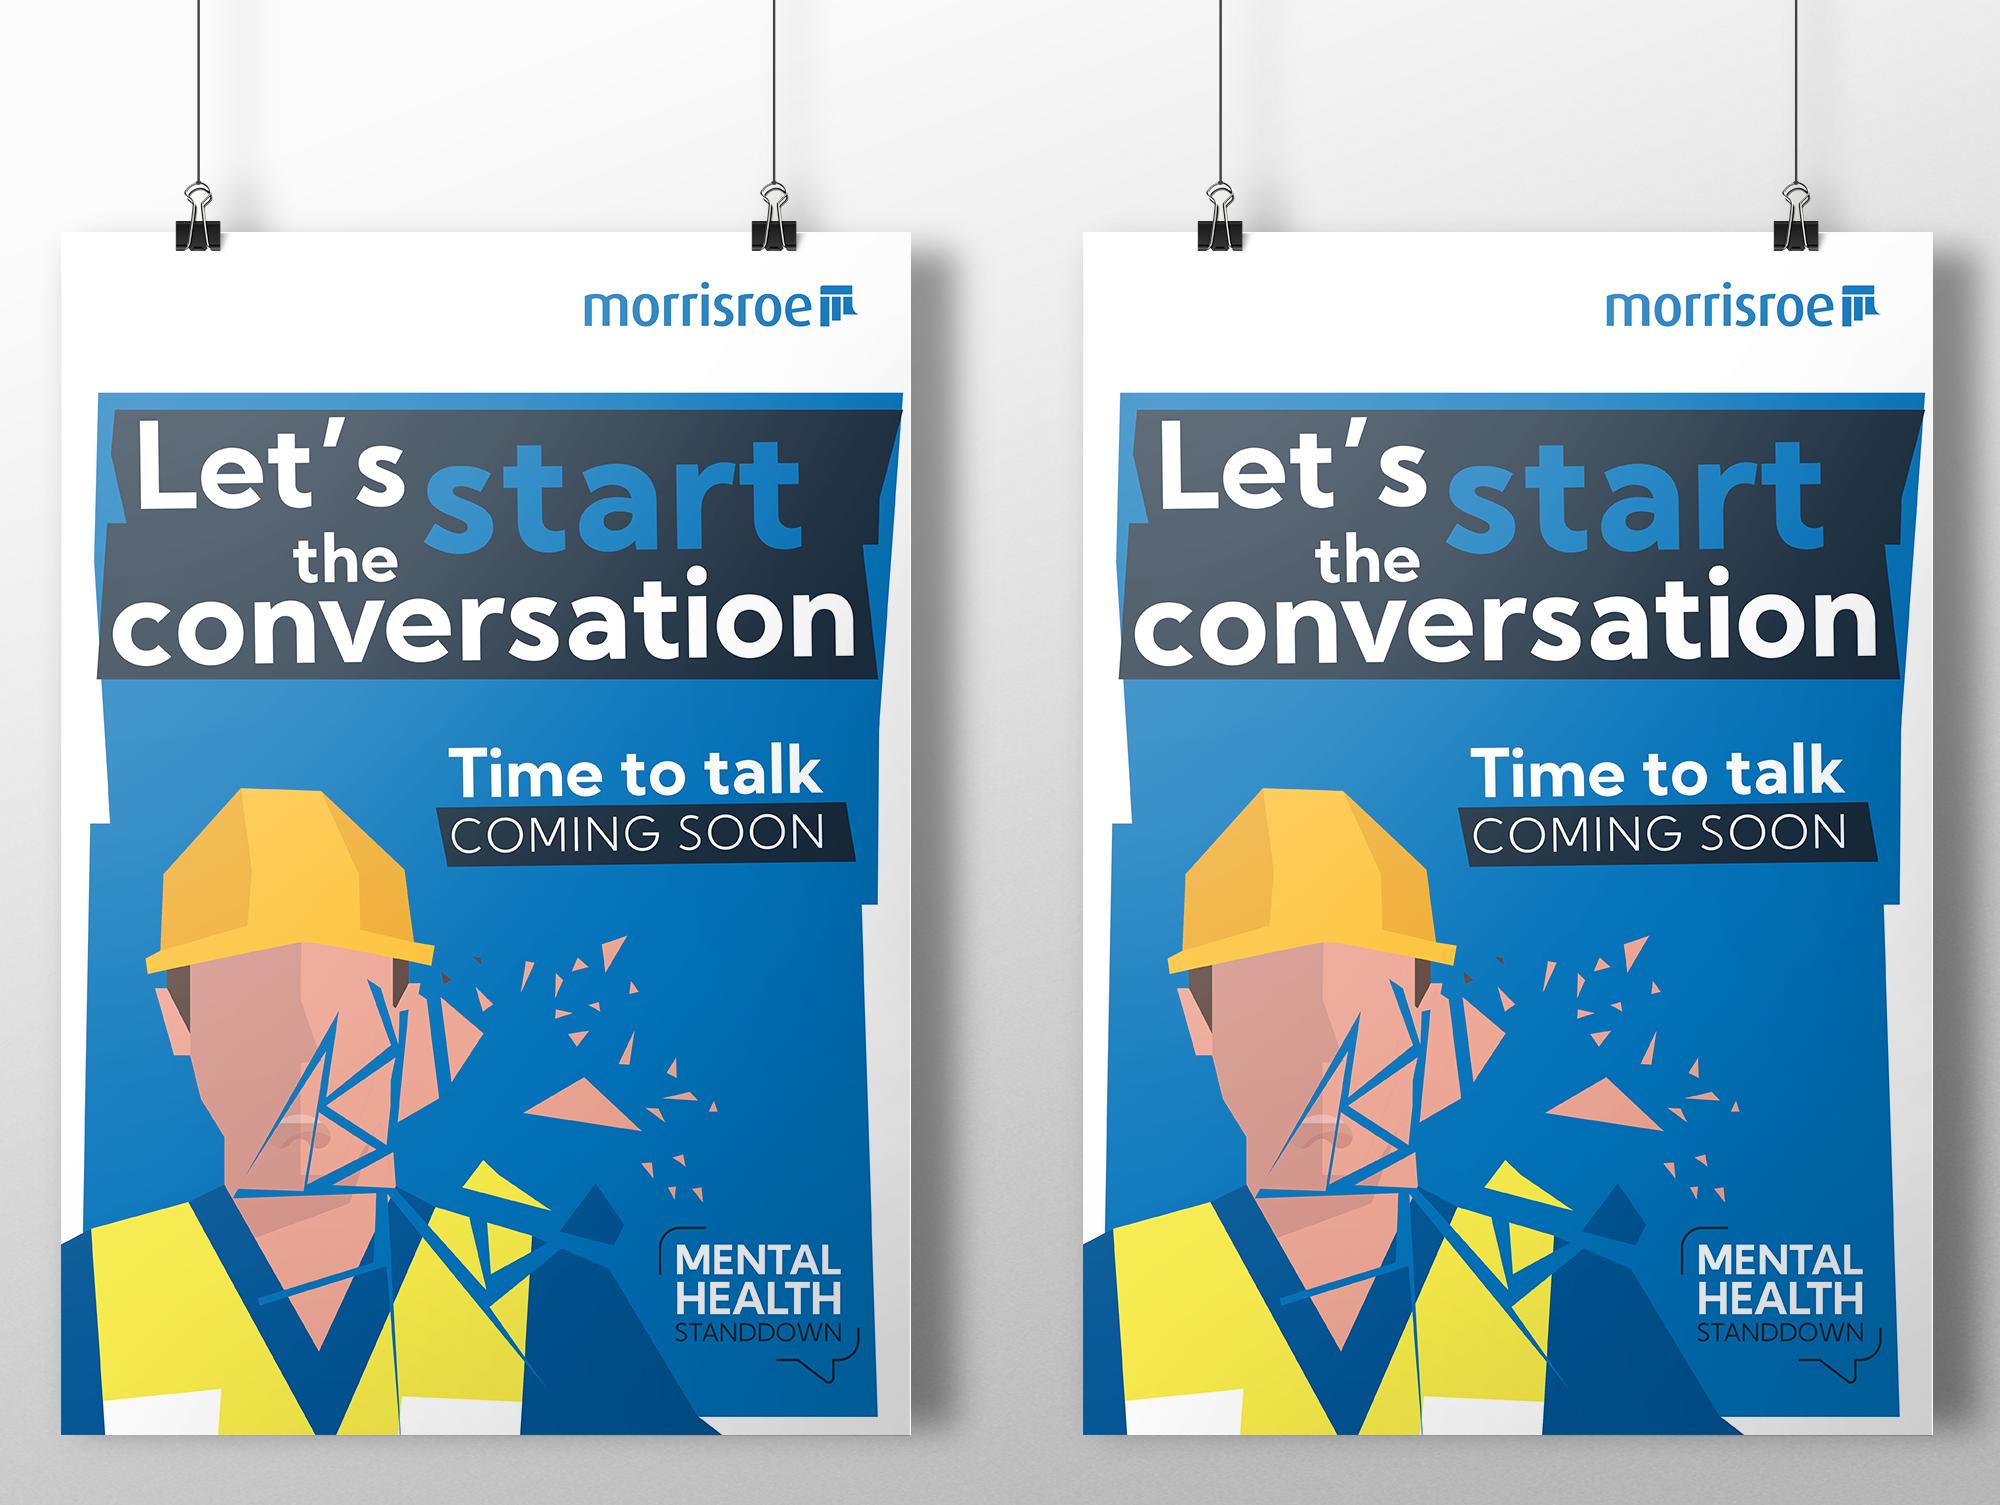 morrisroe campaign